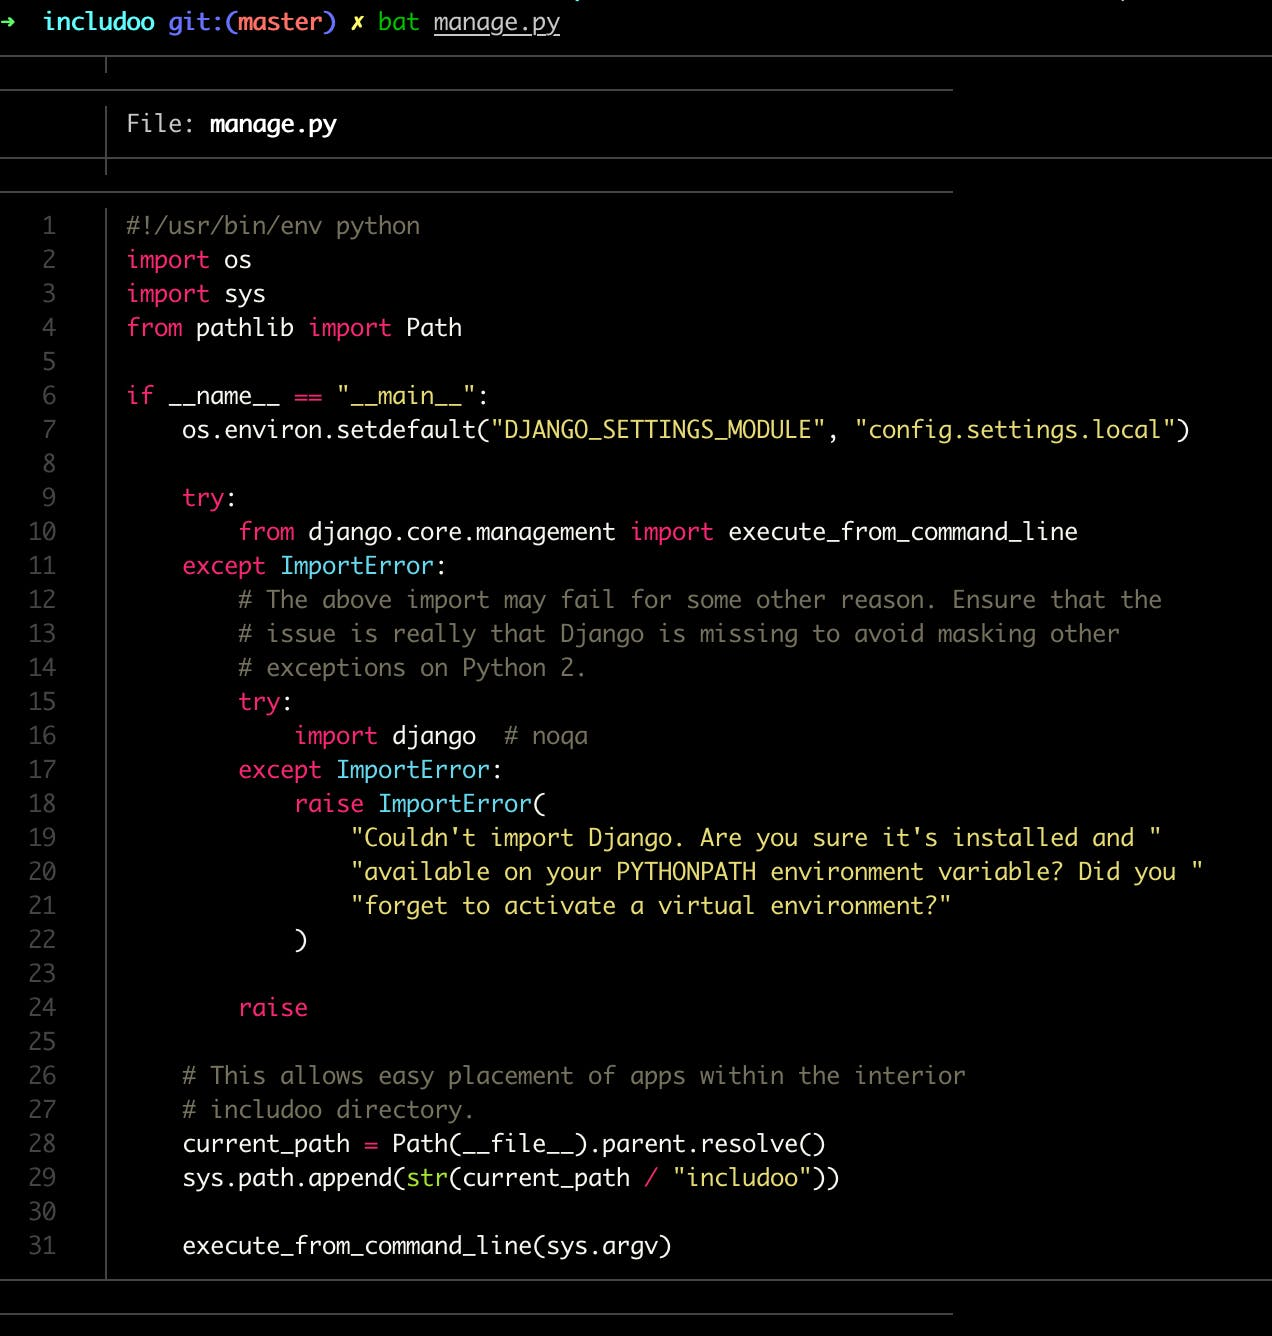 bat highlighting the syntax of Python